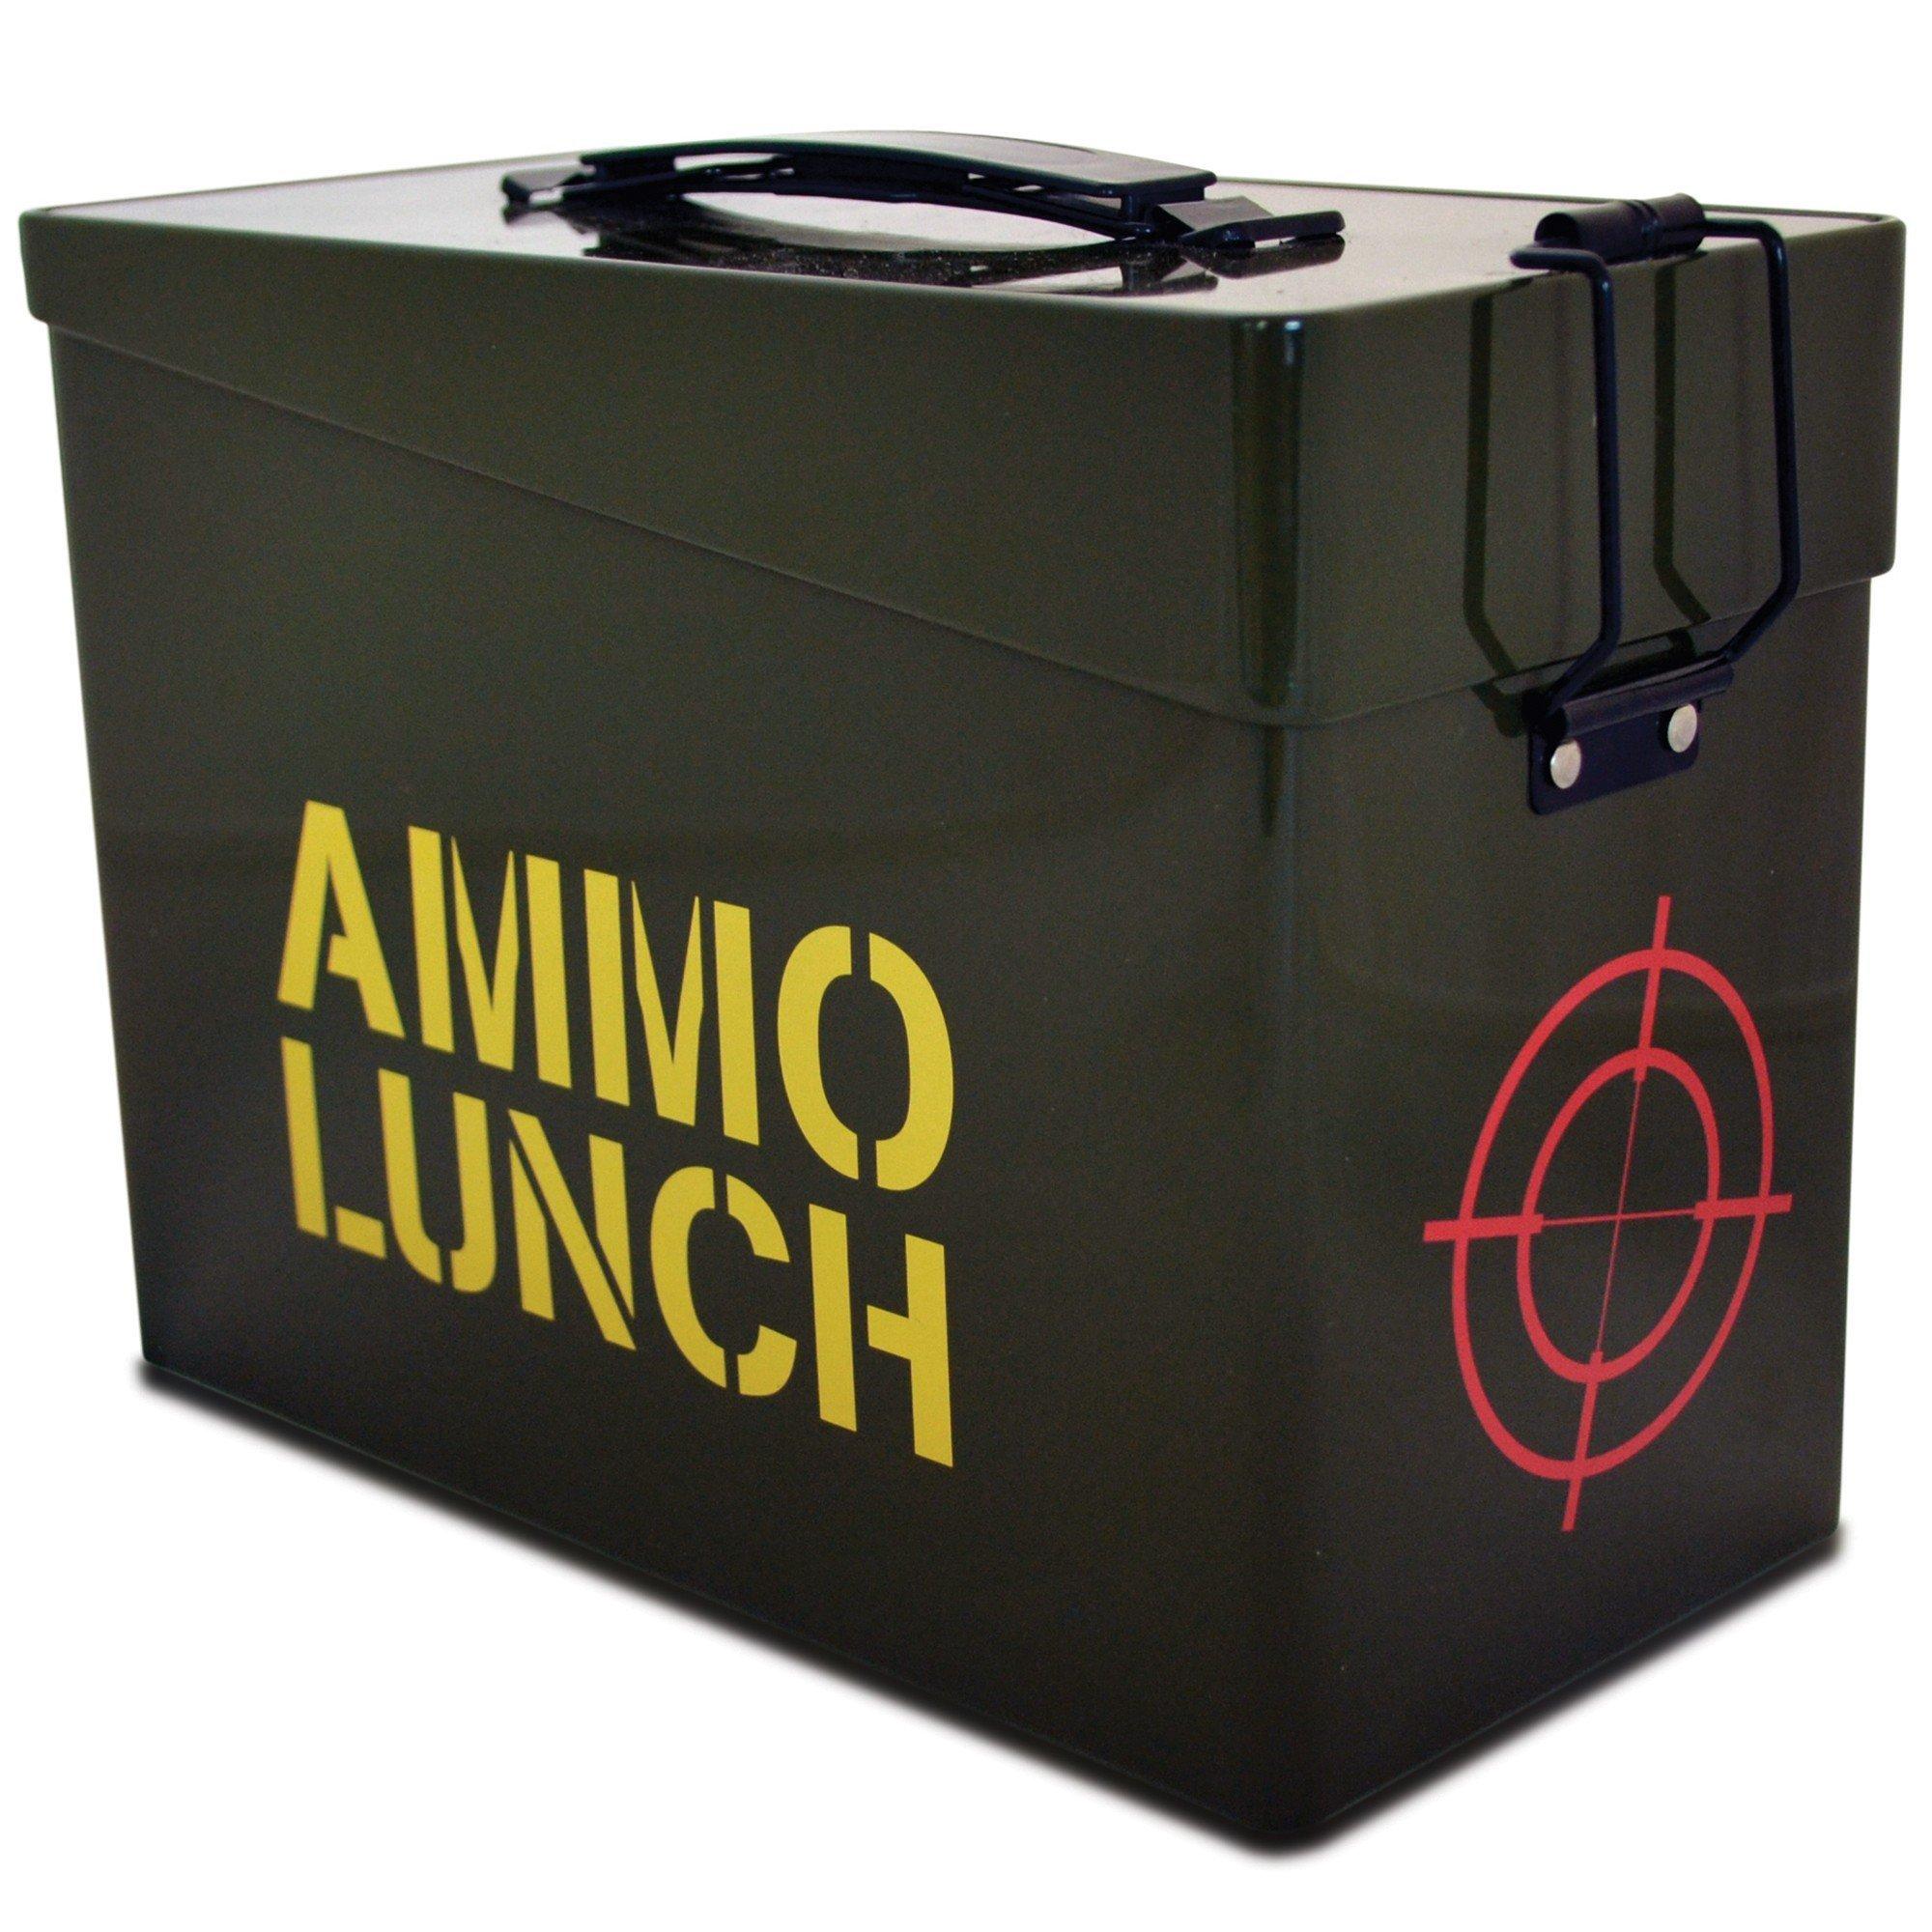 Ammo Lunchlåda thumbnail